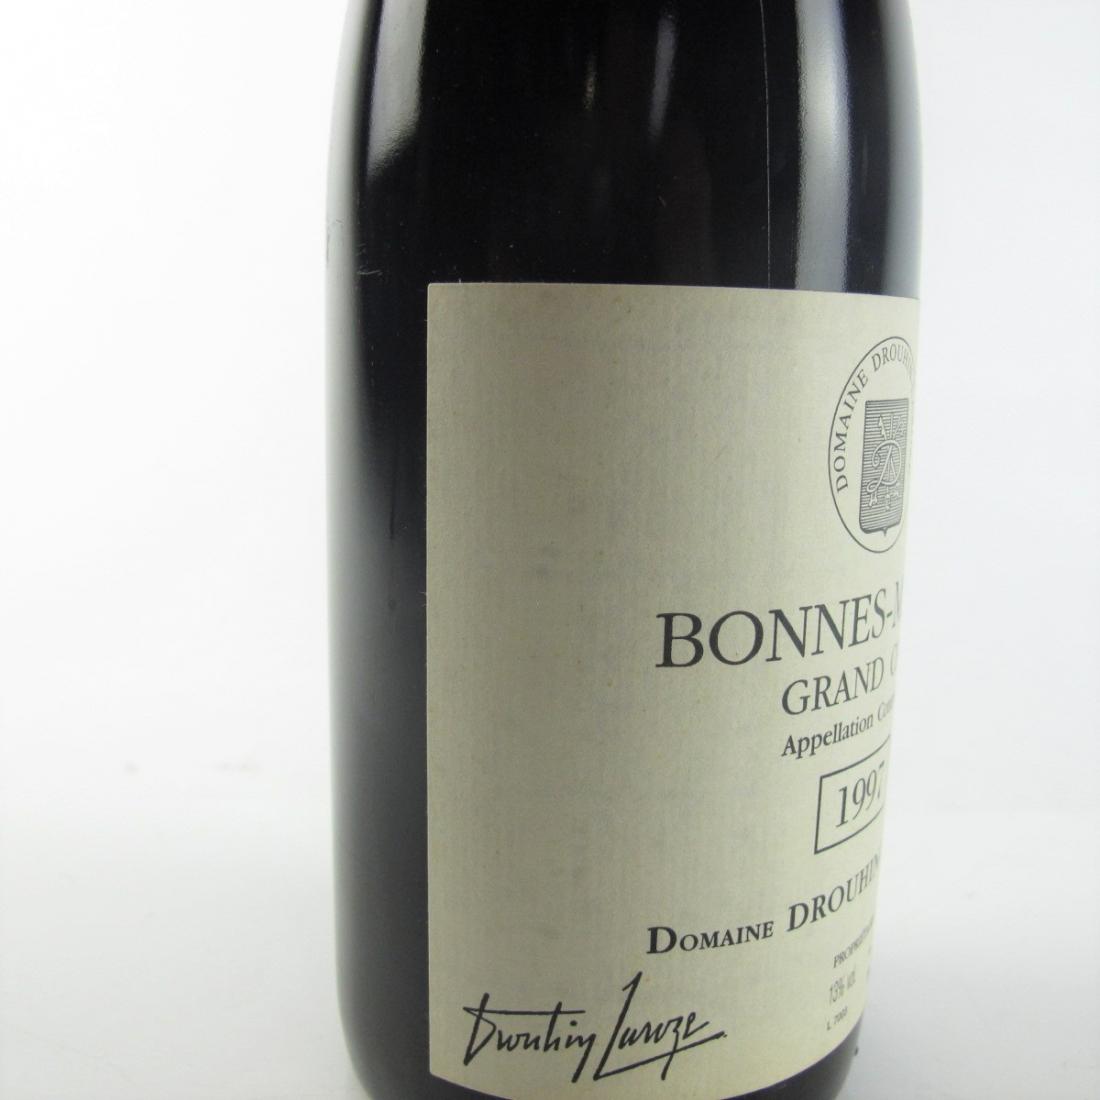 Dom. Drouhin-Laroze 1997 Bonnes-Mares Grand-Cru